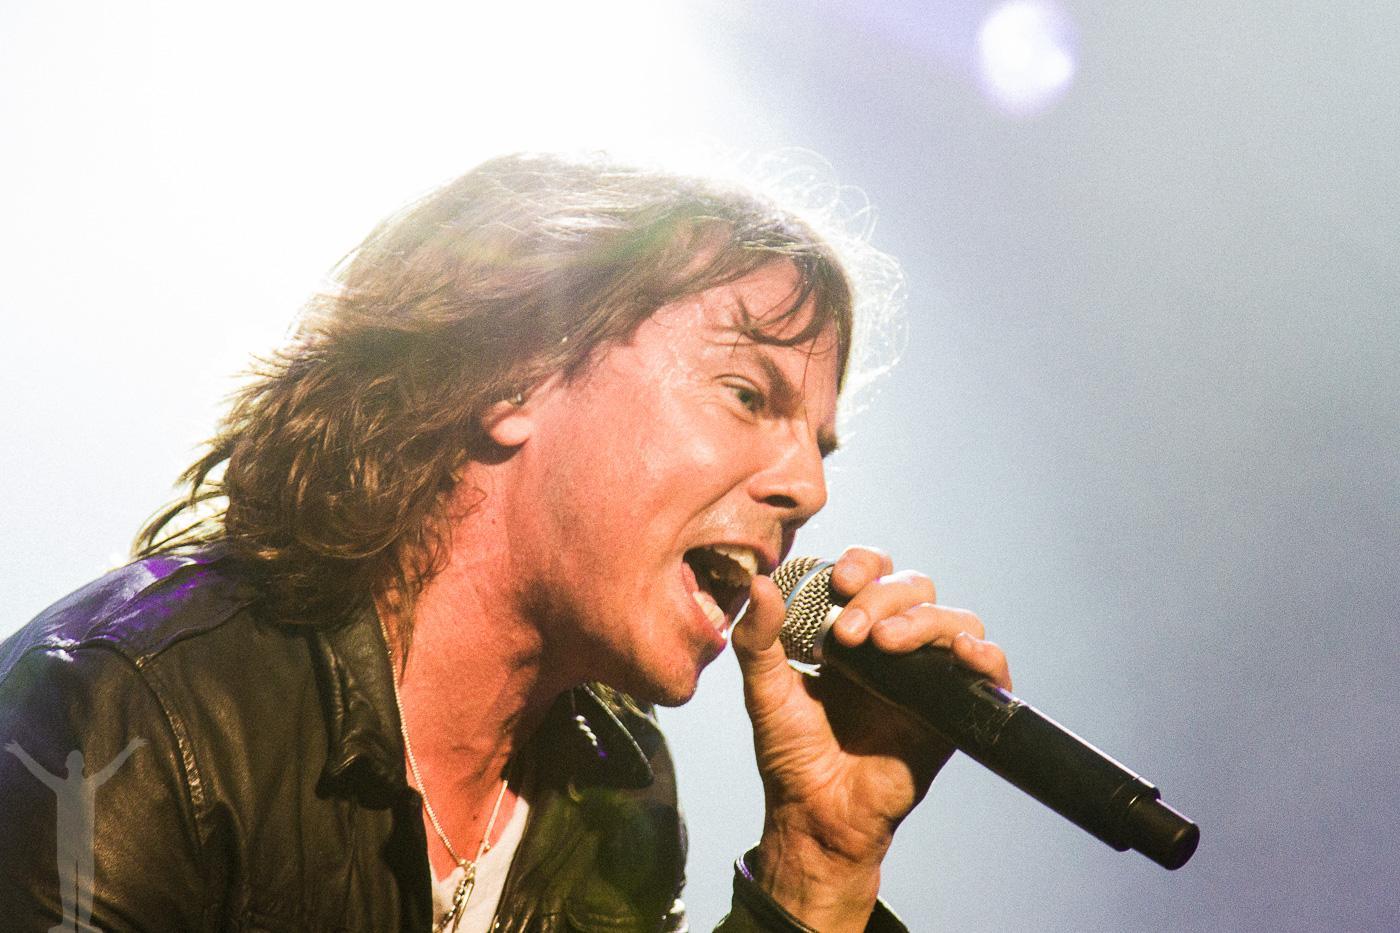 Joey Tempest, Europe - Storsjöyran 2010